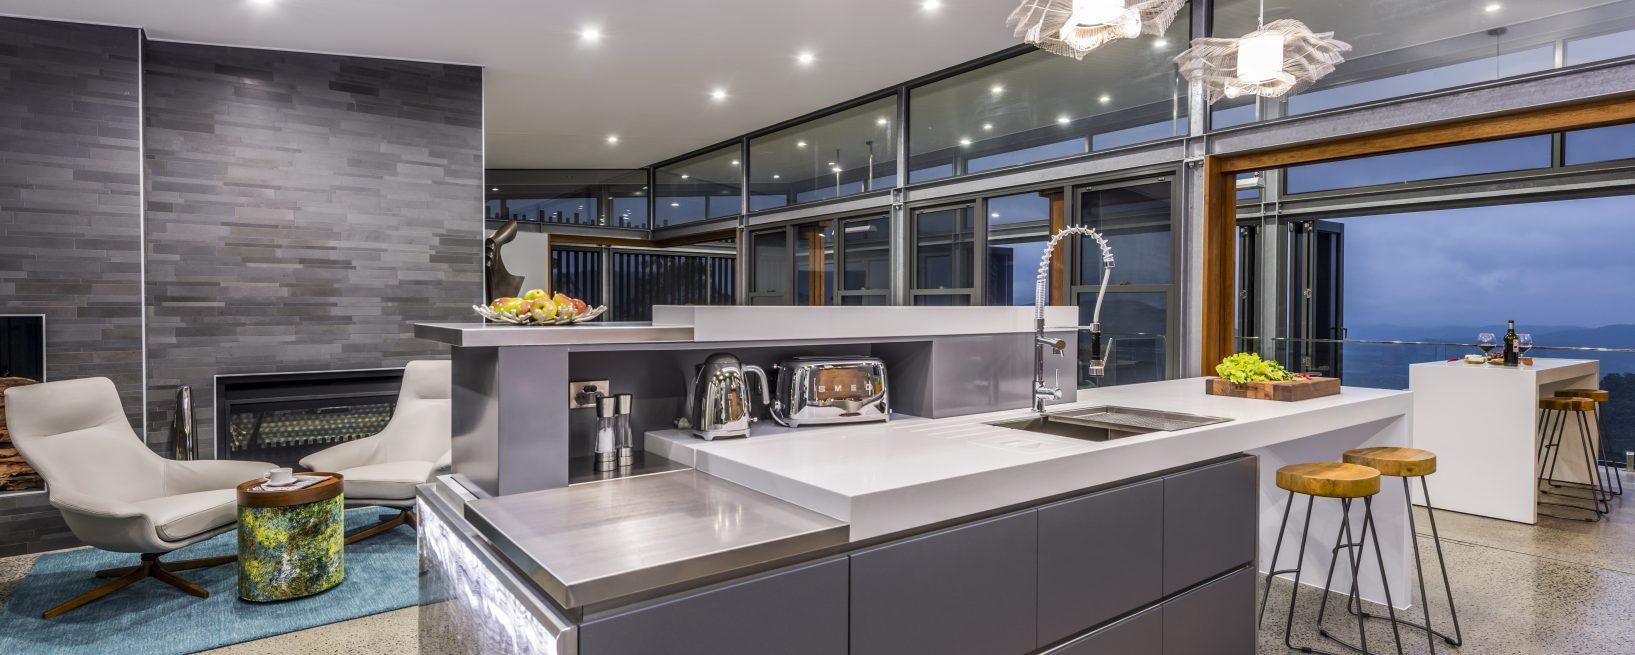 Mount Nebo - New Kitchen